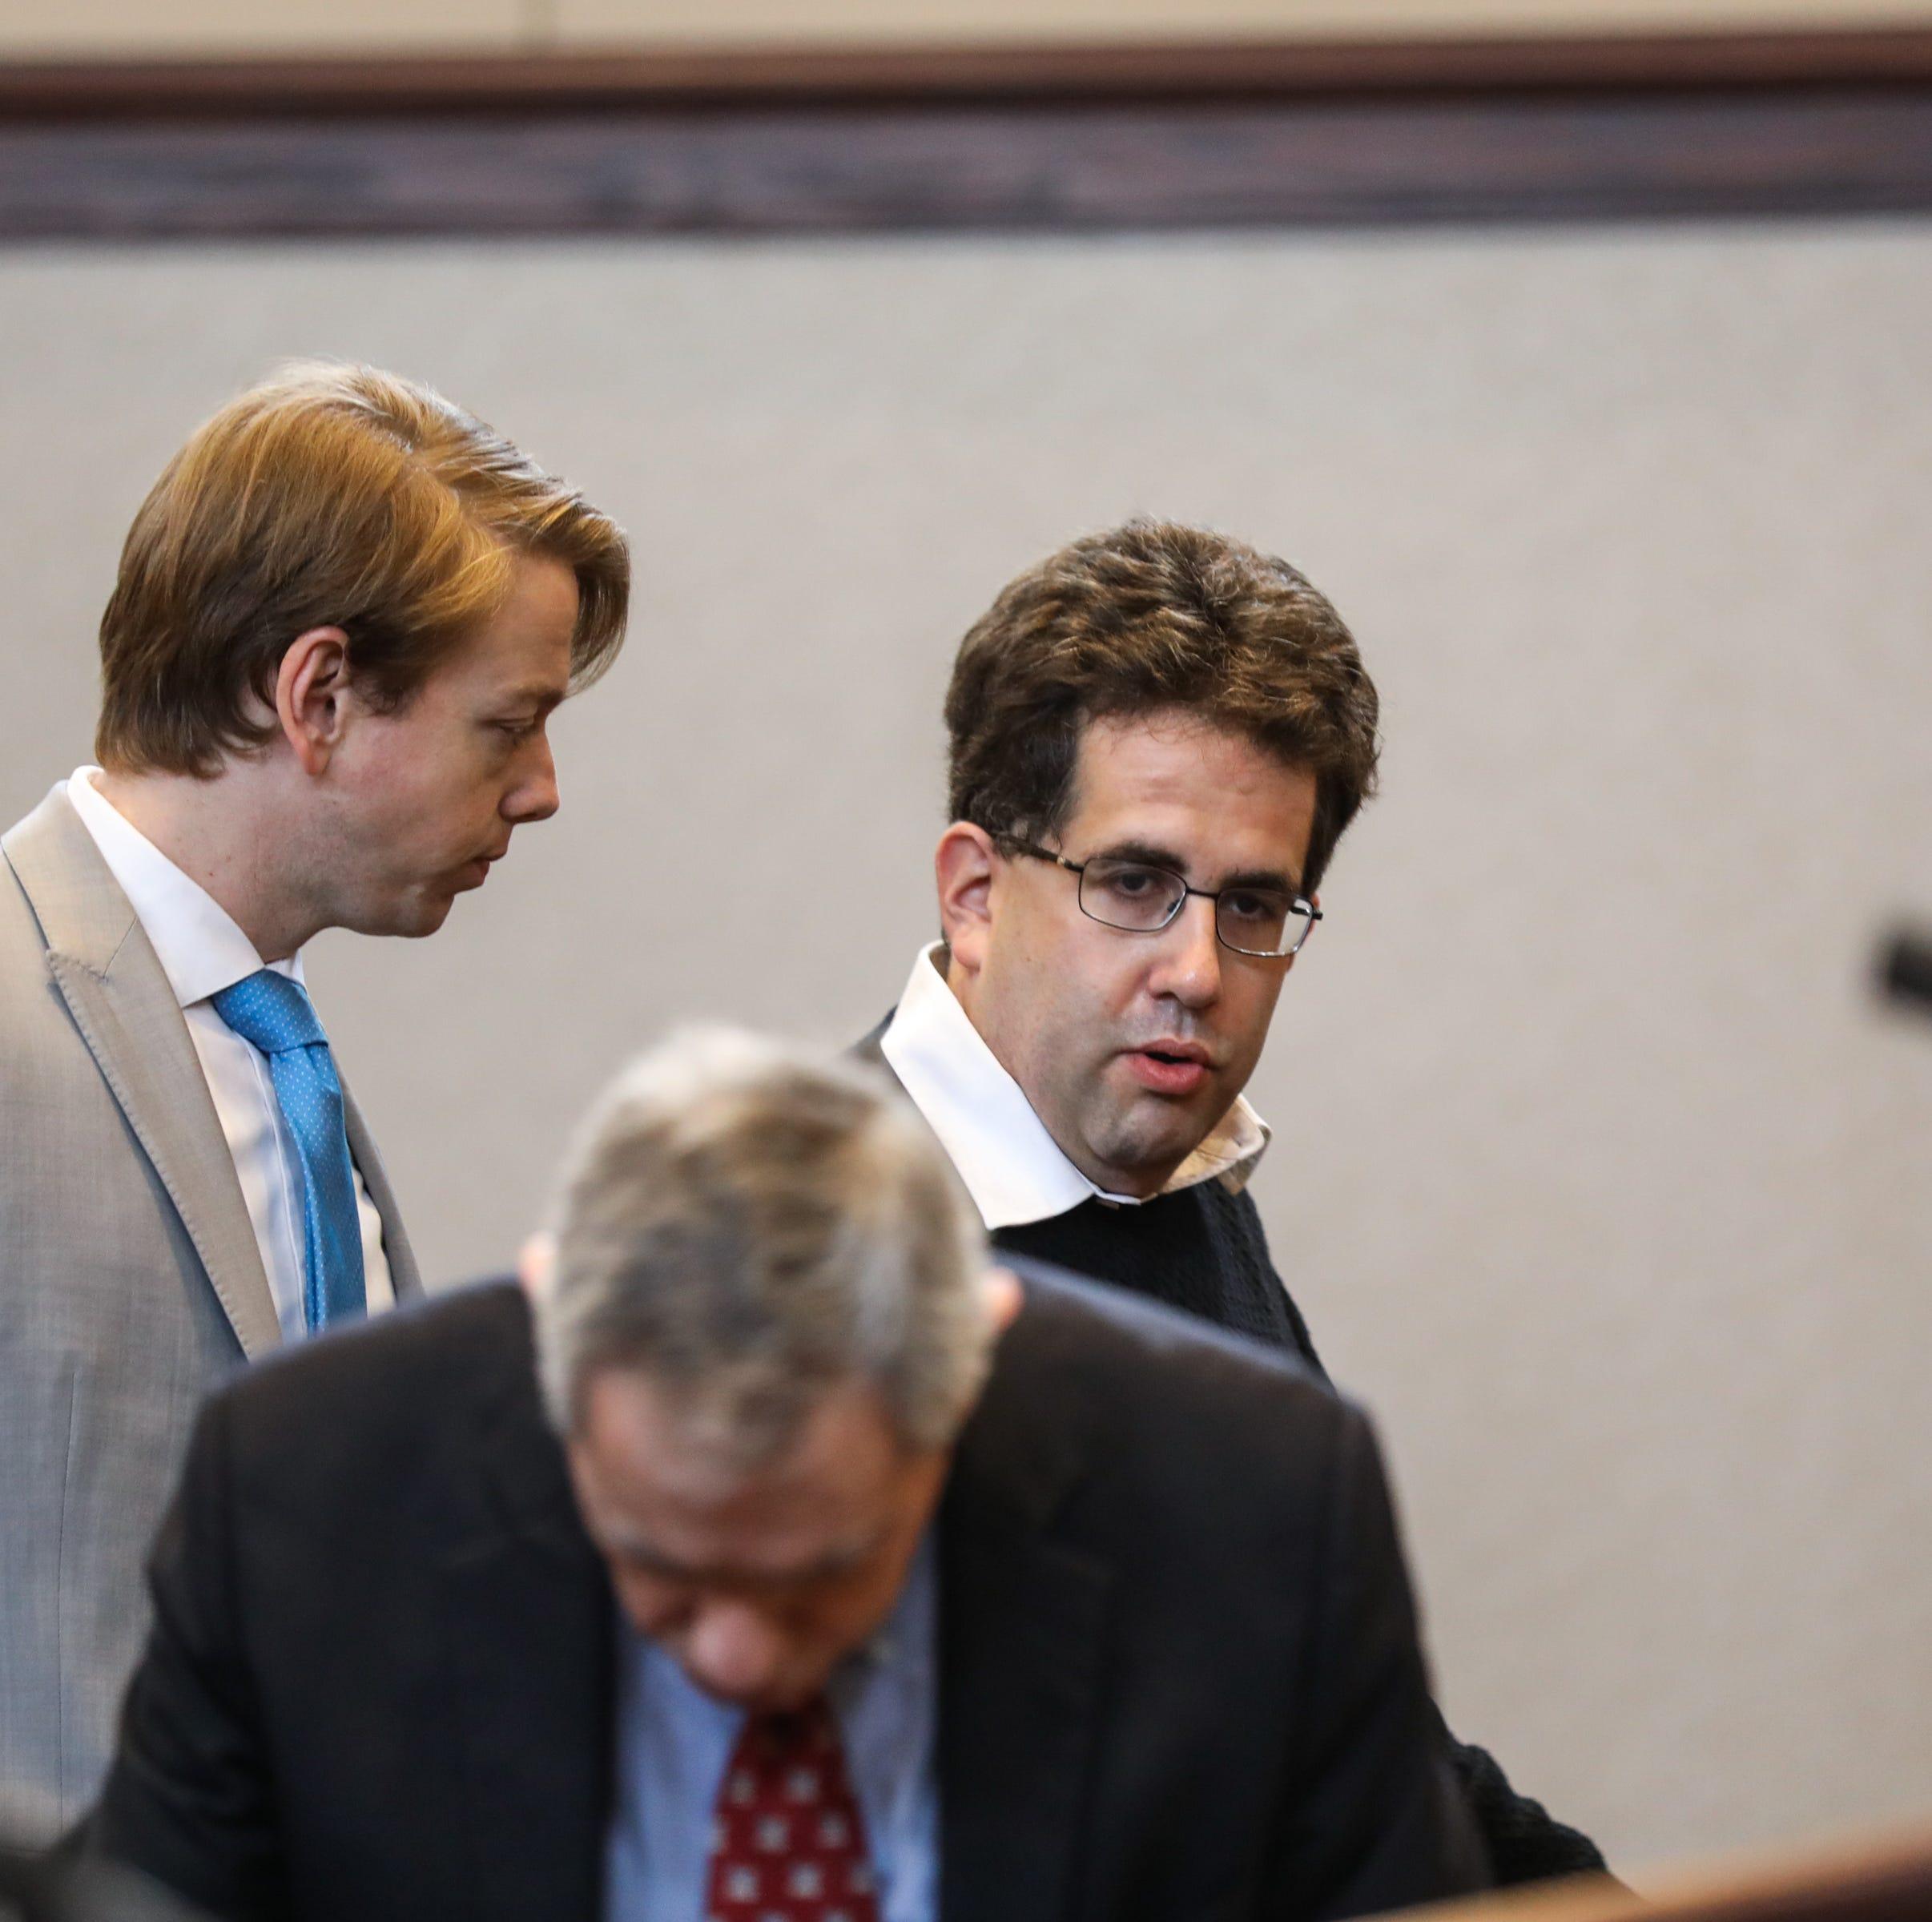 Judge: Substitute teacher accused of masturbating in class guilty, gets probation